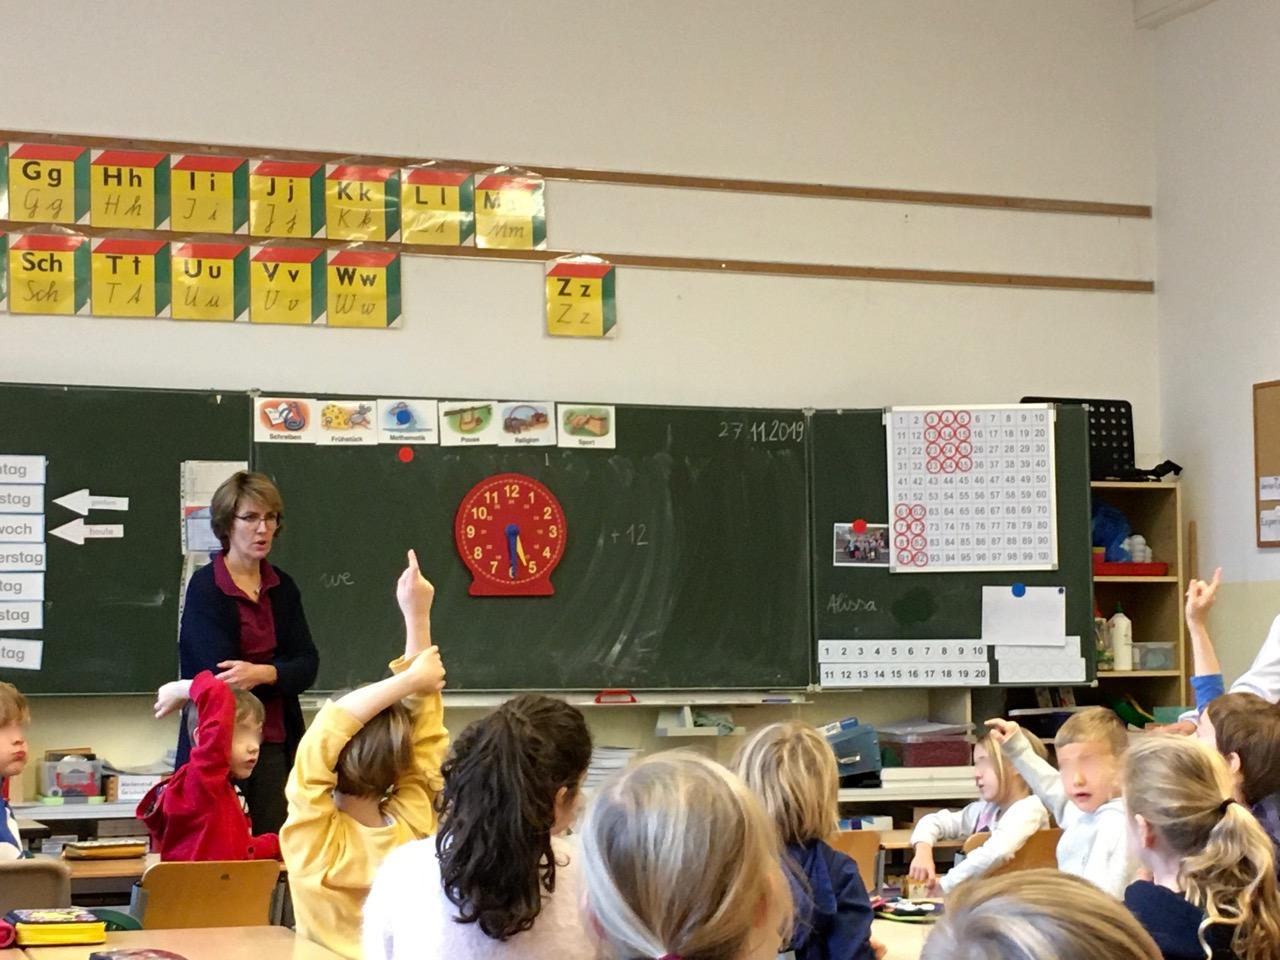 Hospitieren in der Grundschule / ドイツの小学校で授業参観4